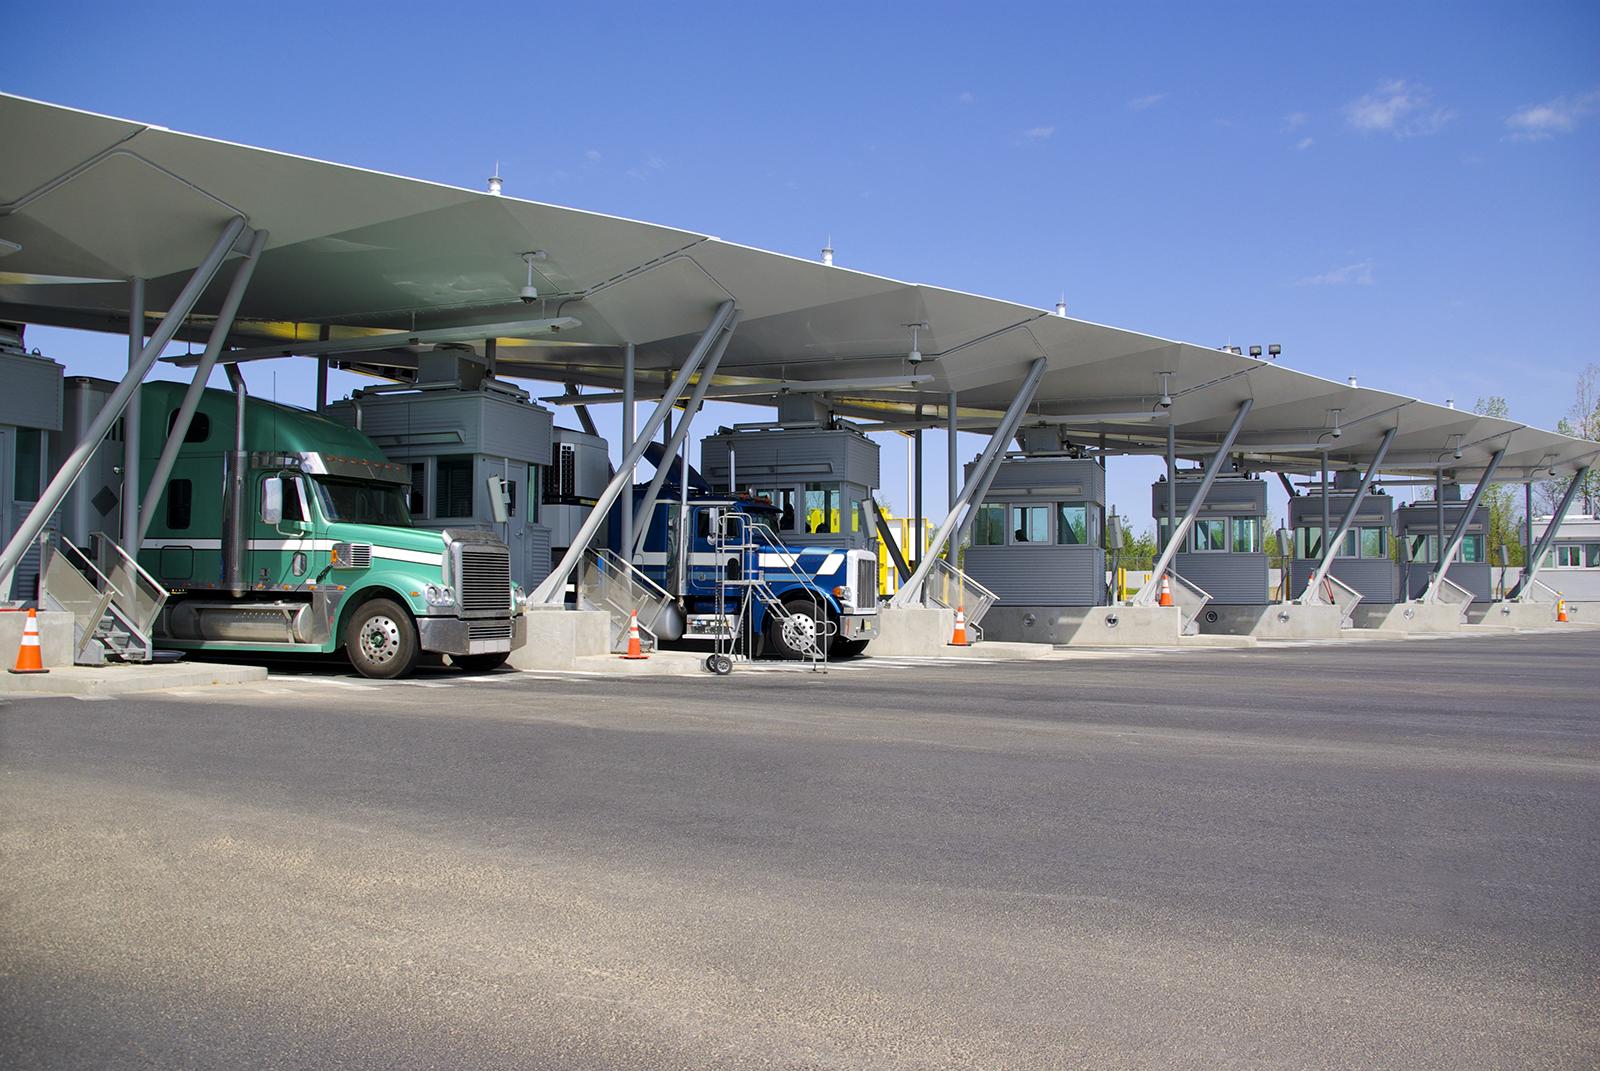 Semi-trucks-pay-at-tollbooth-at-Canadian-border-000034492786_Large.jpg